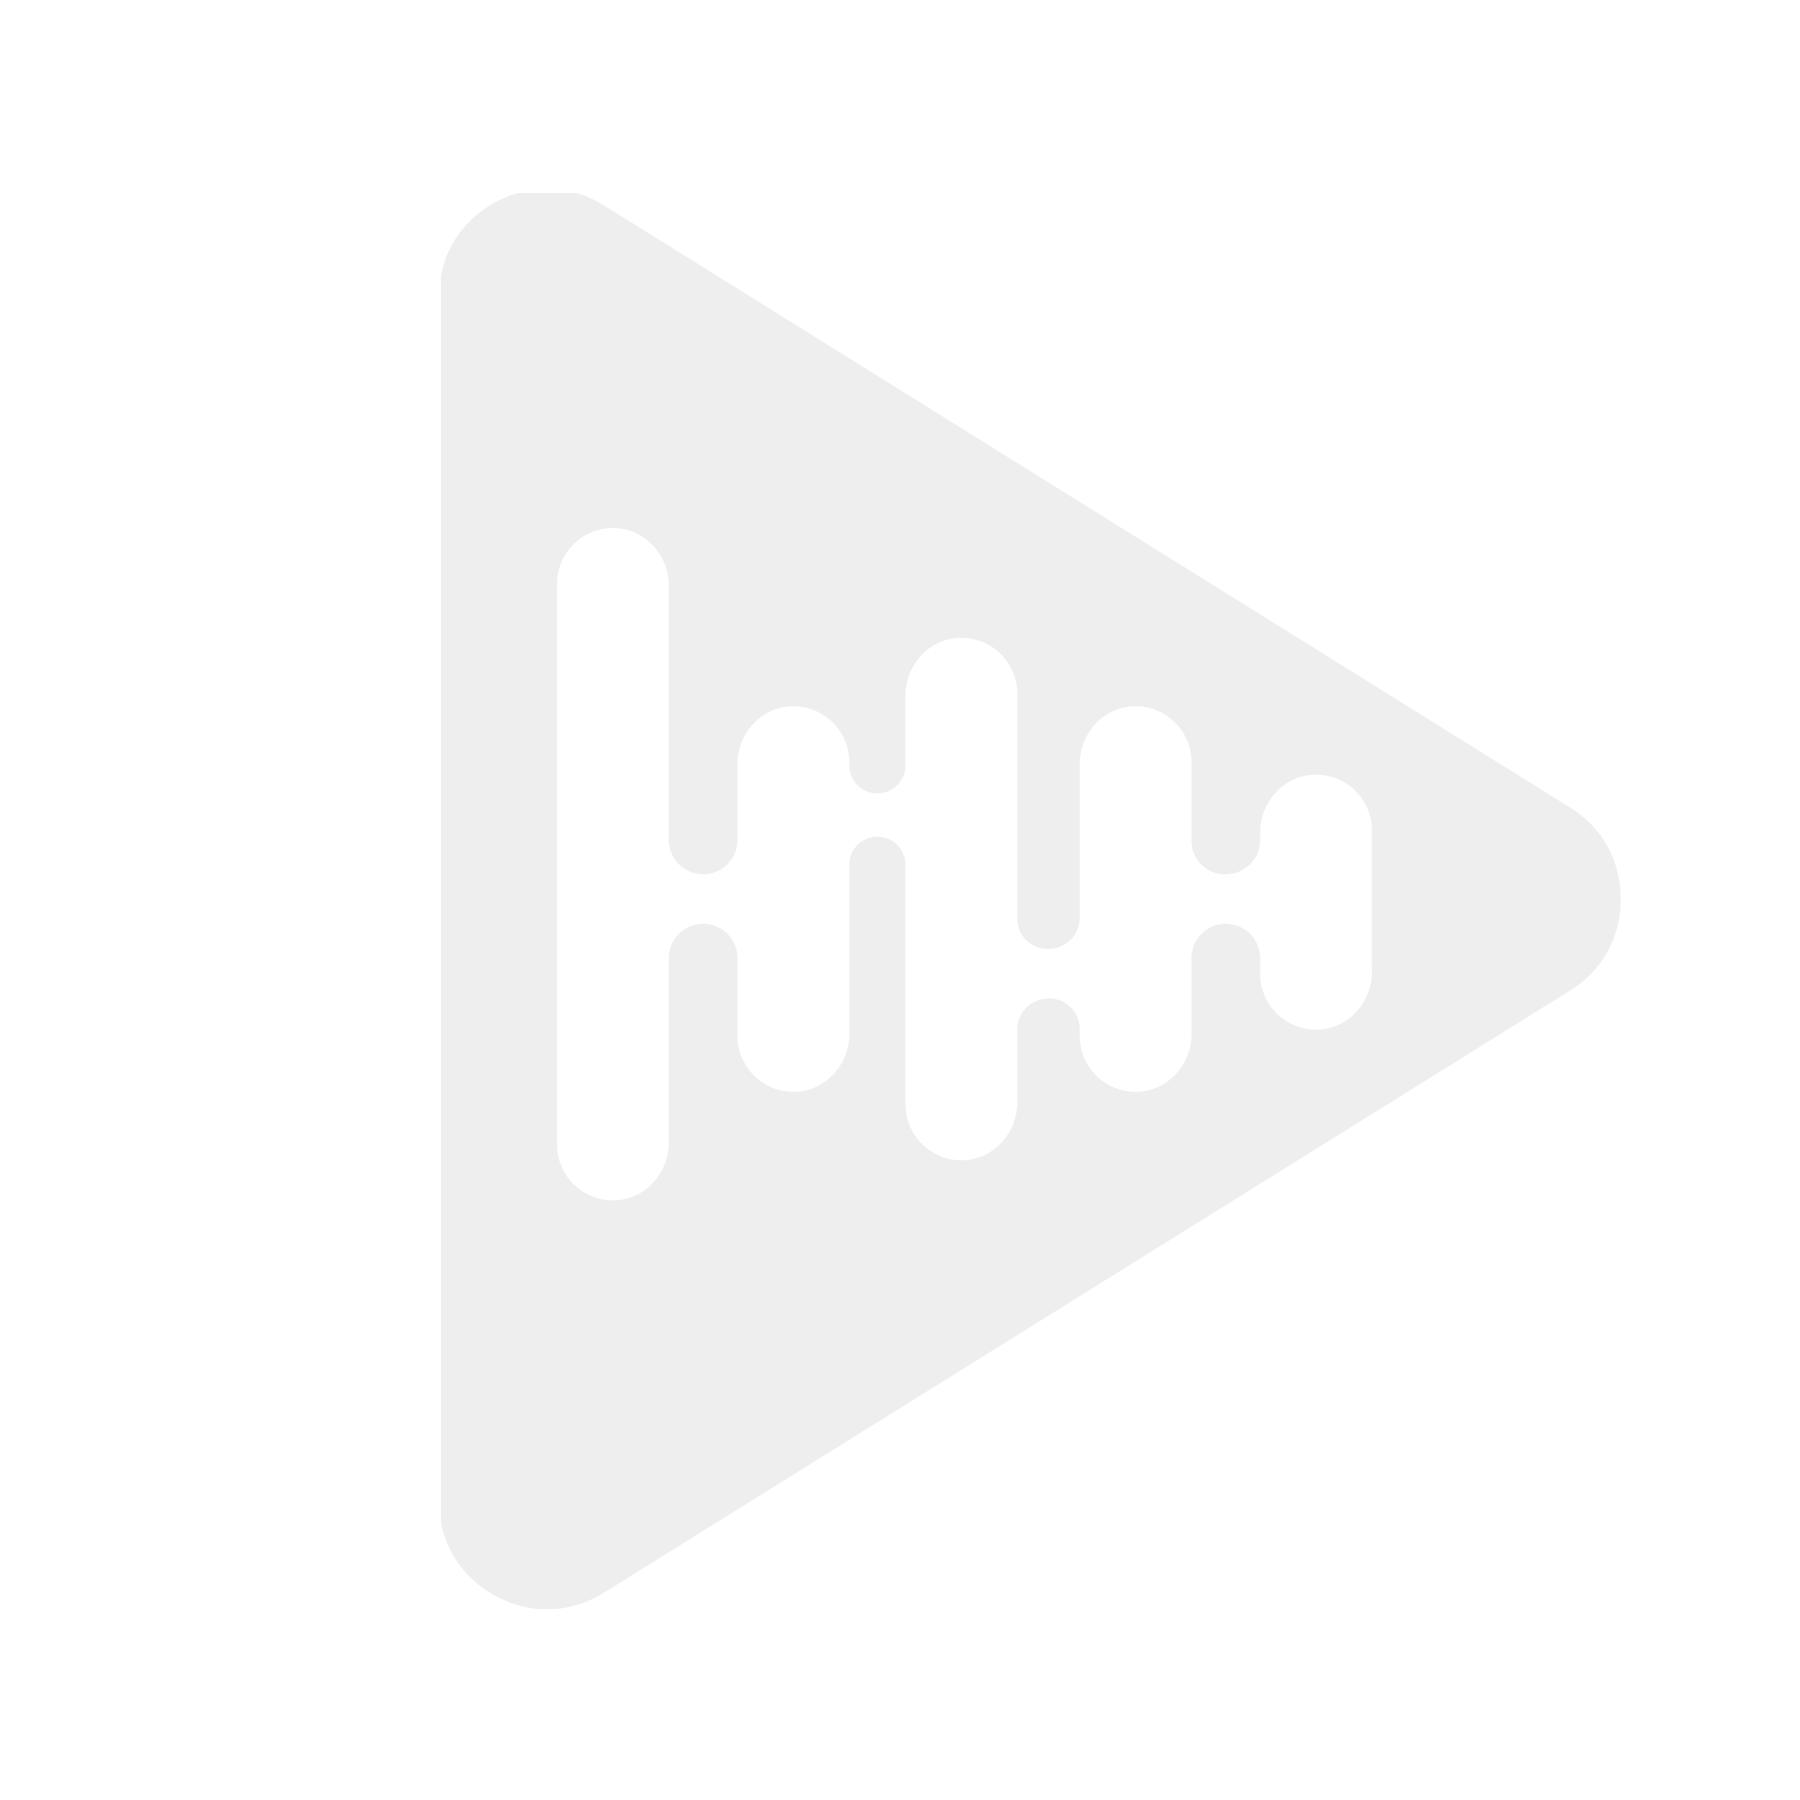 Hertz Dieci DG 130.3 - 5,25